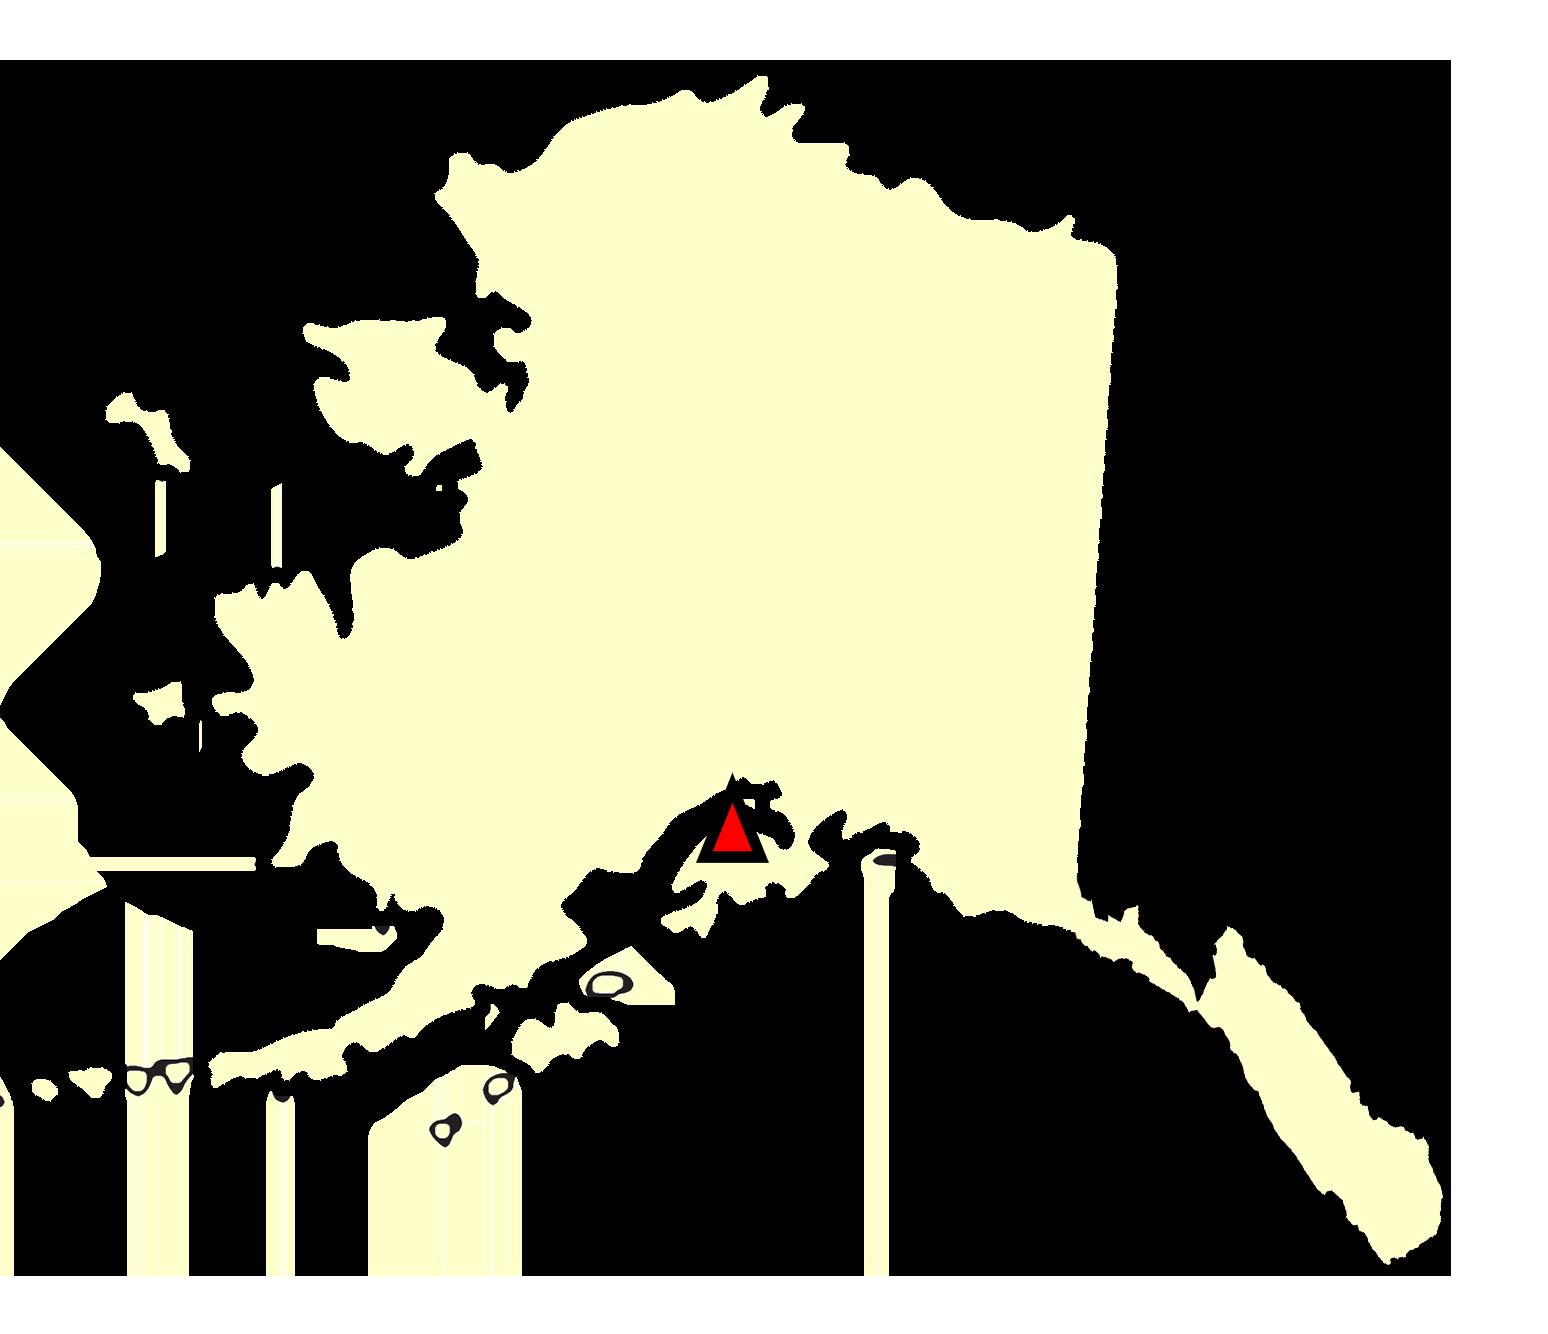 State map location for AK Kenai